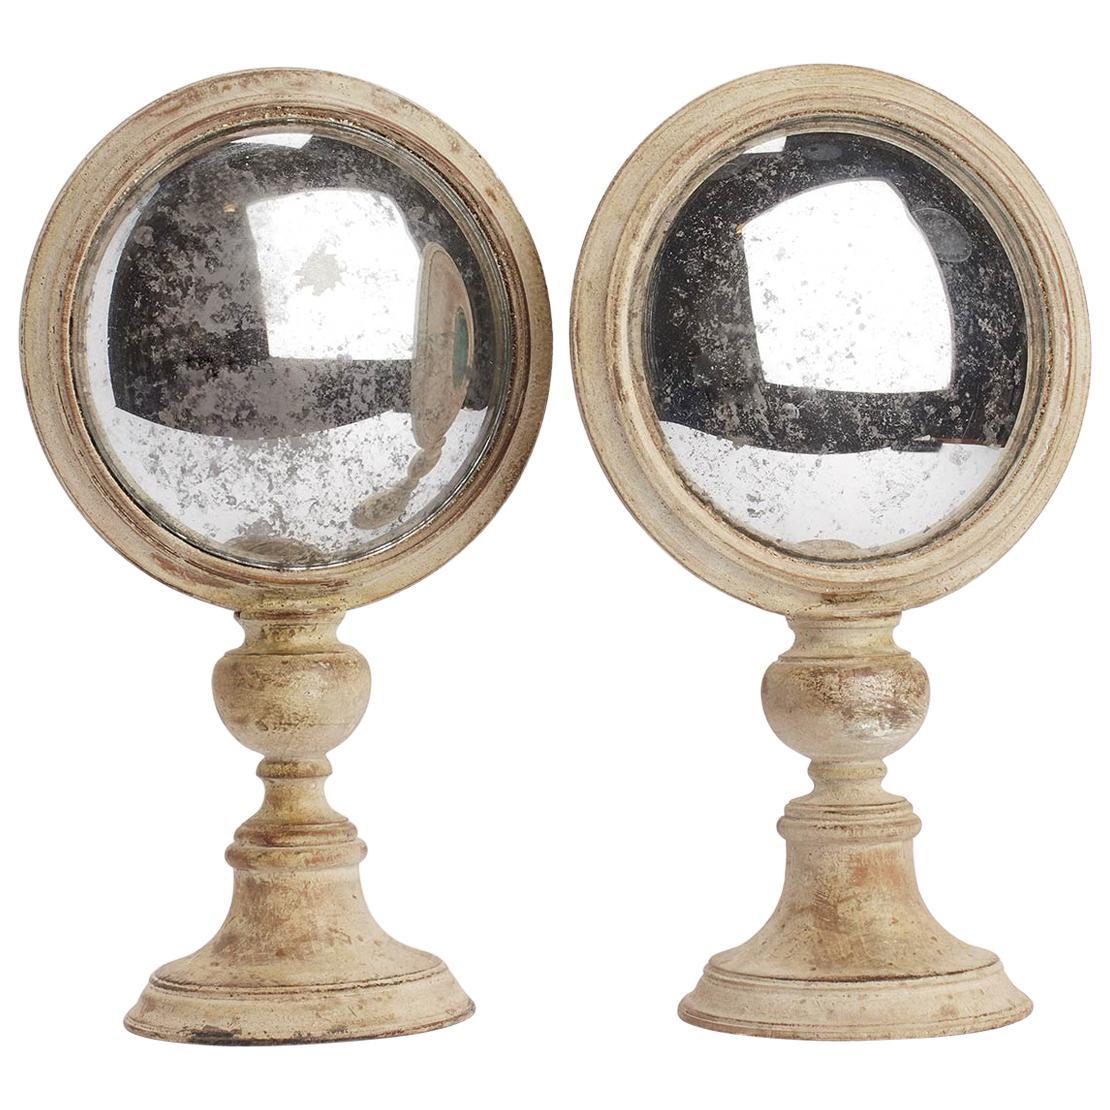 Convex Round Mirrors, Italy, 1870